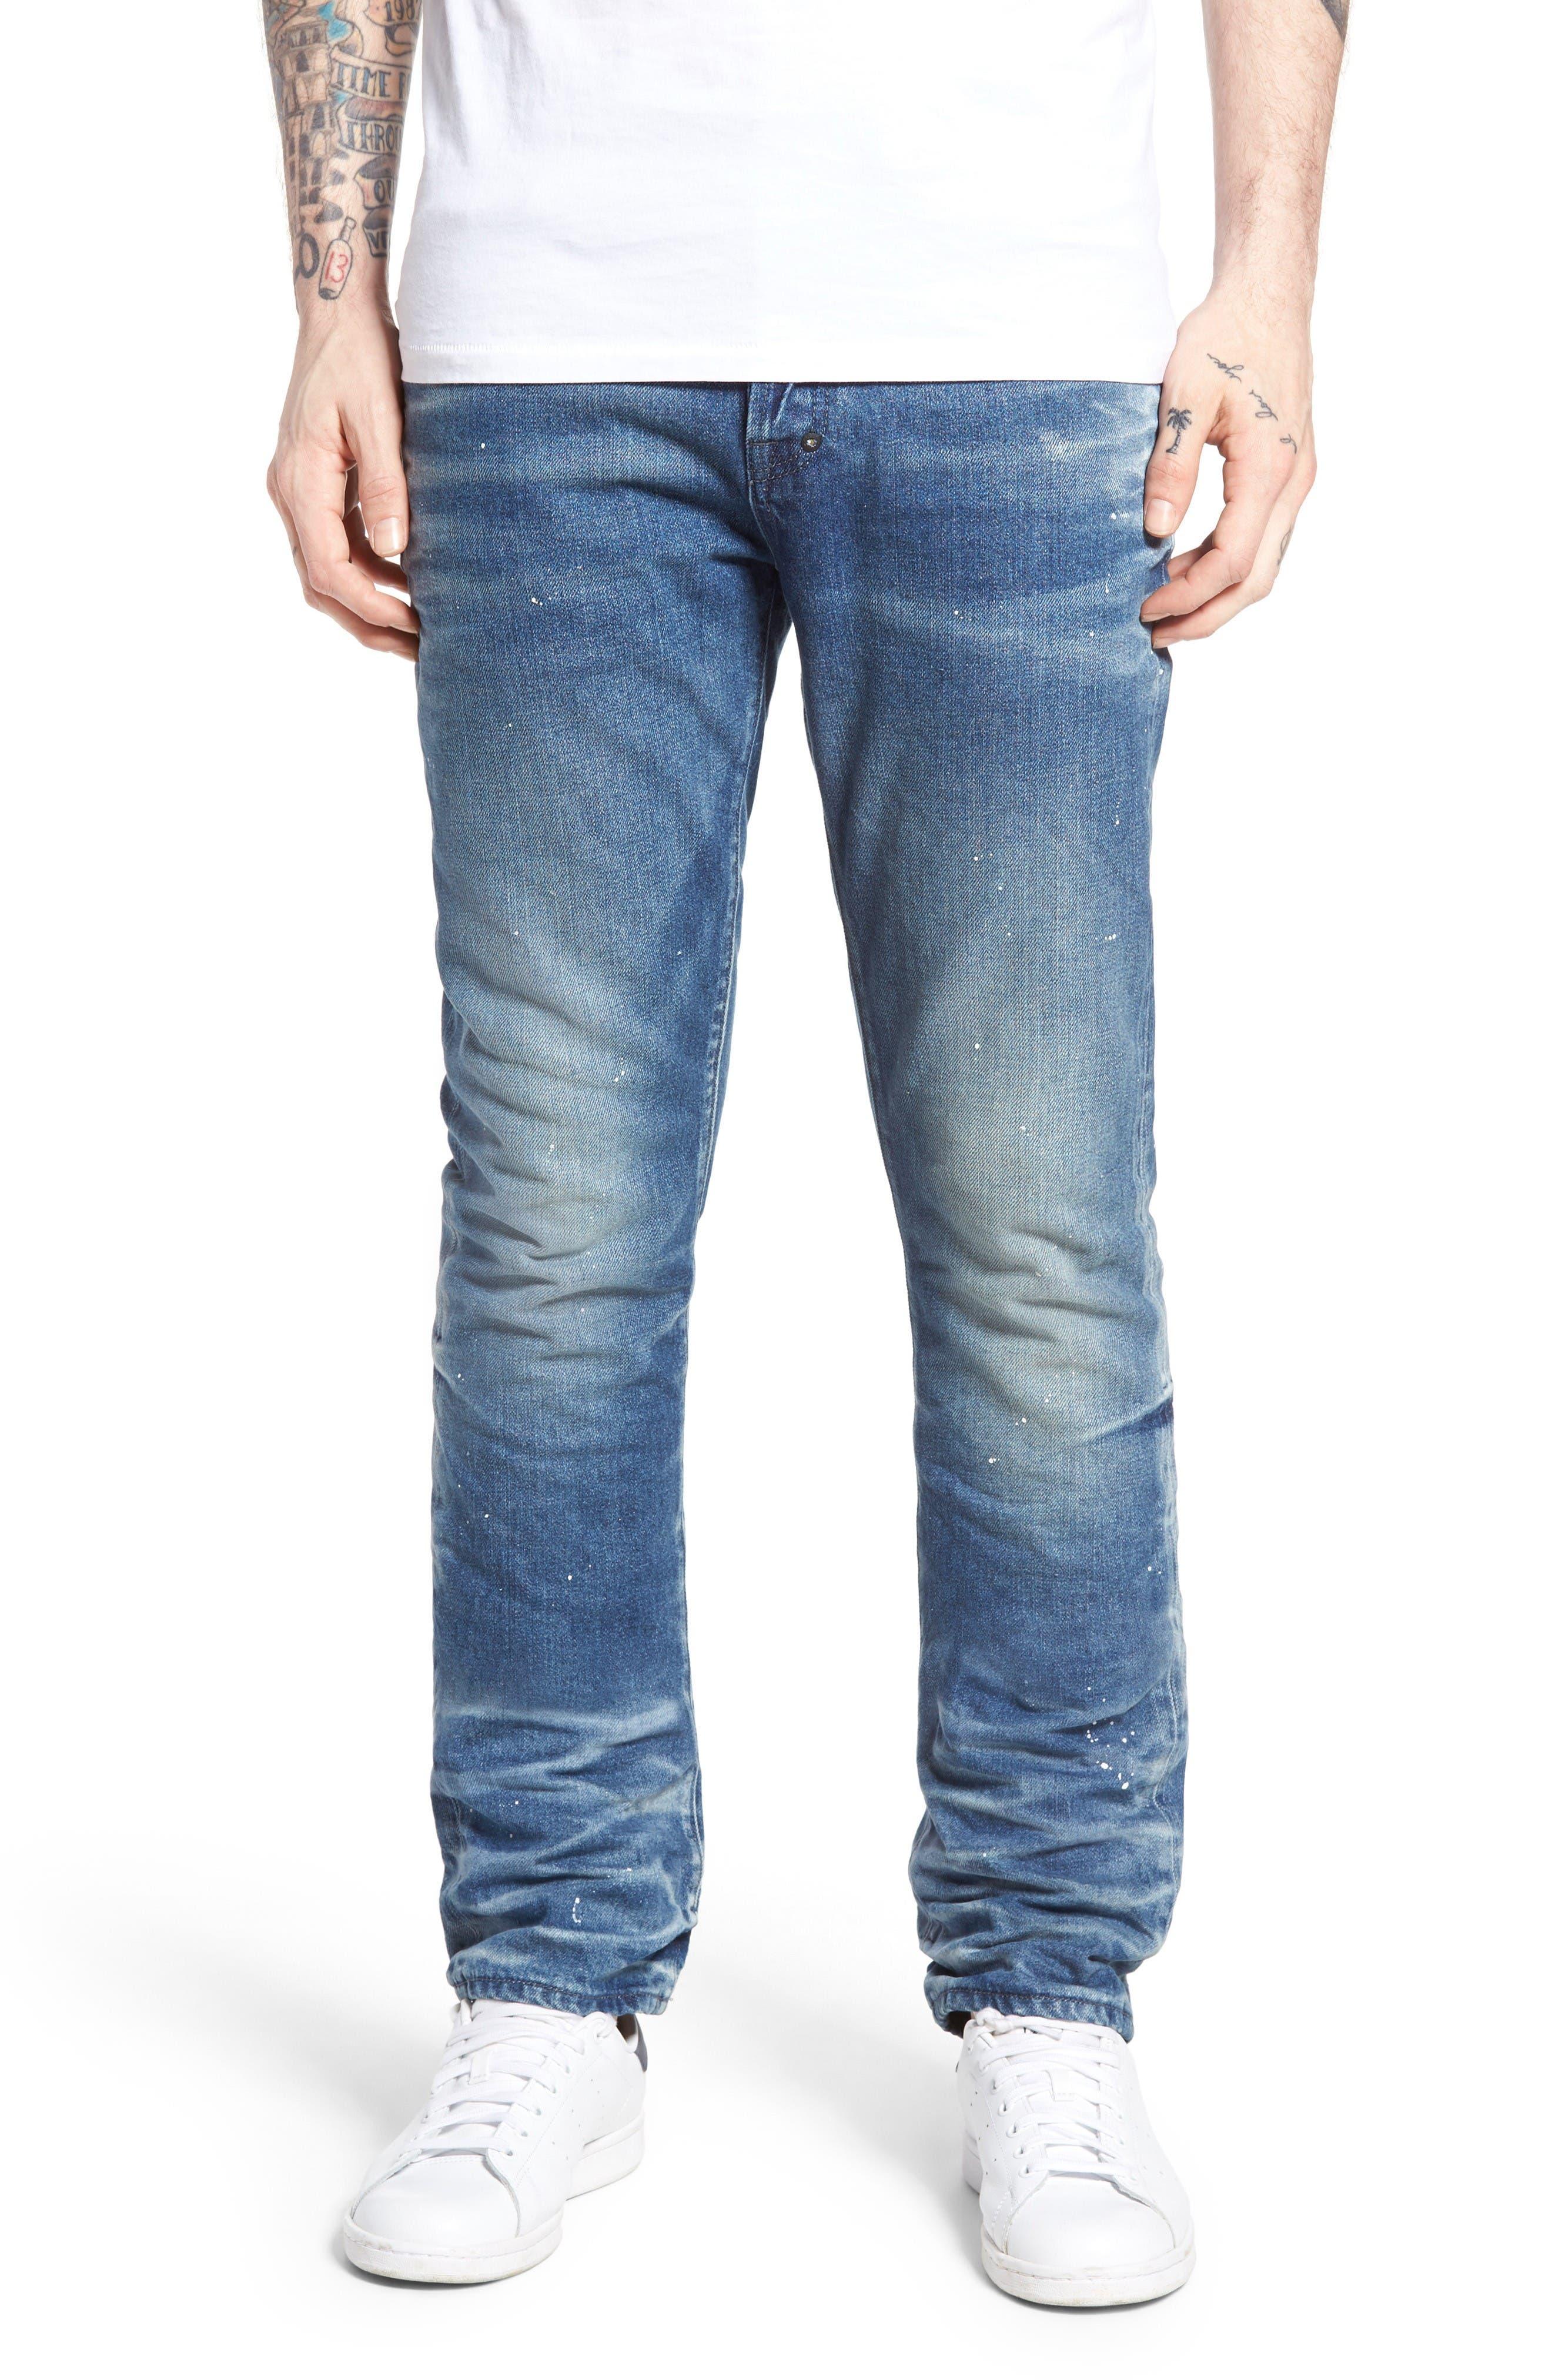 Demon Slim Straight Leg Jeans,                         Main,                         color, Mediam